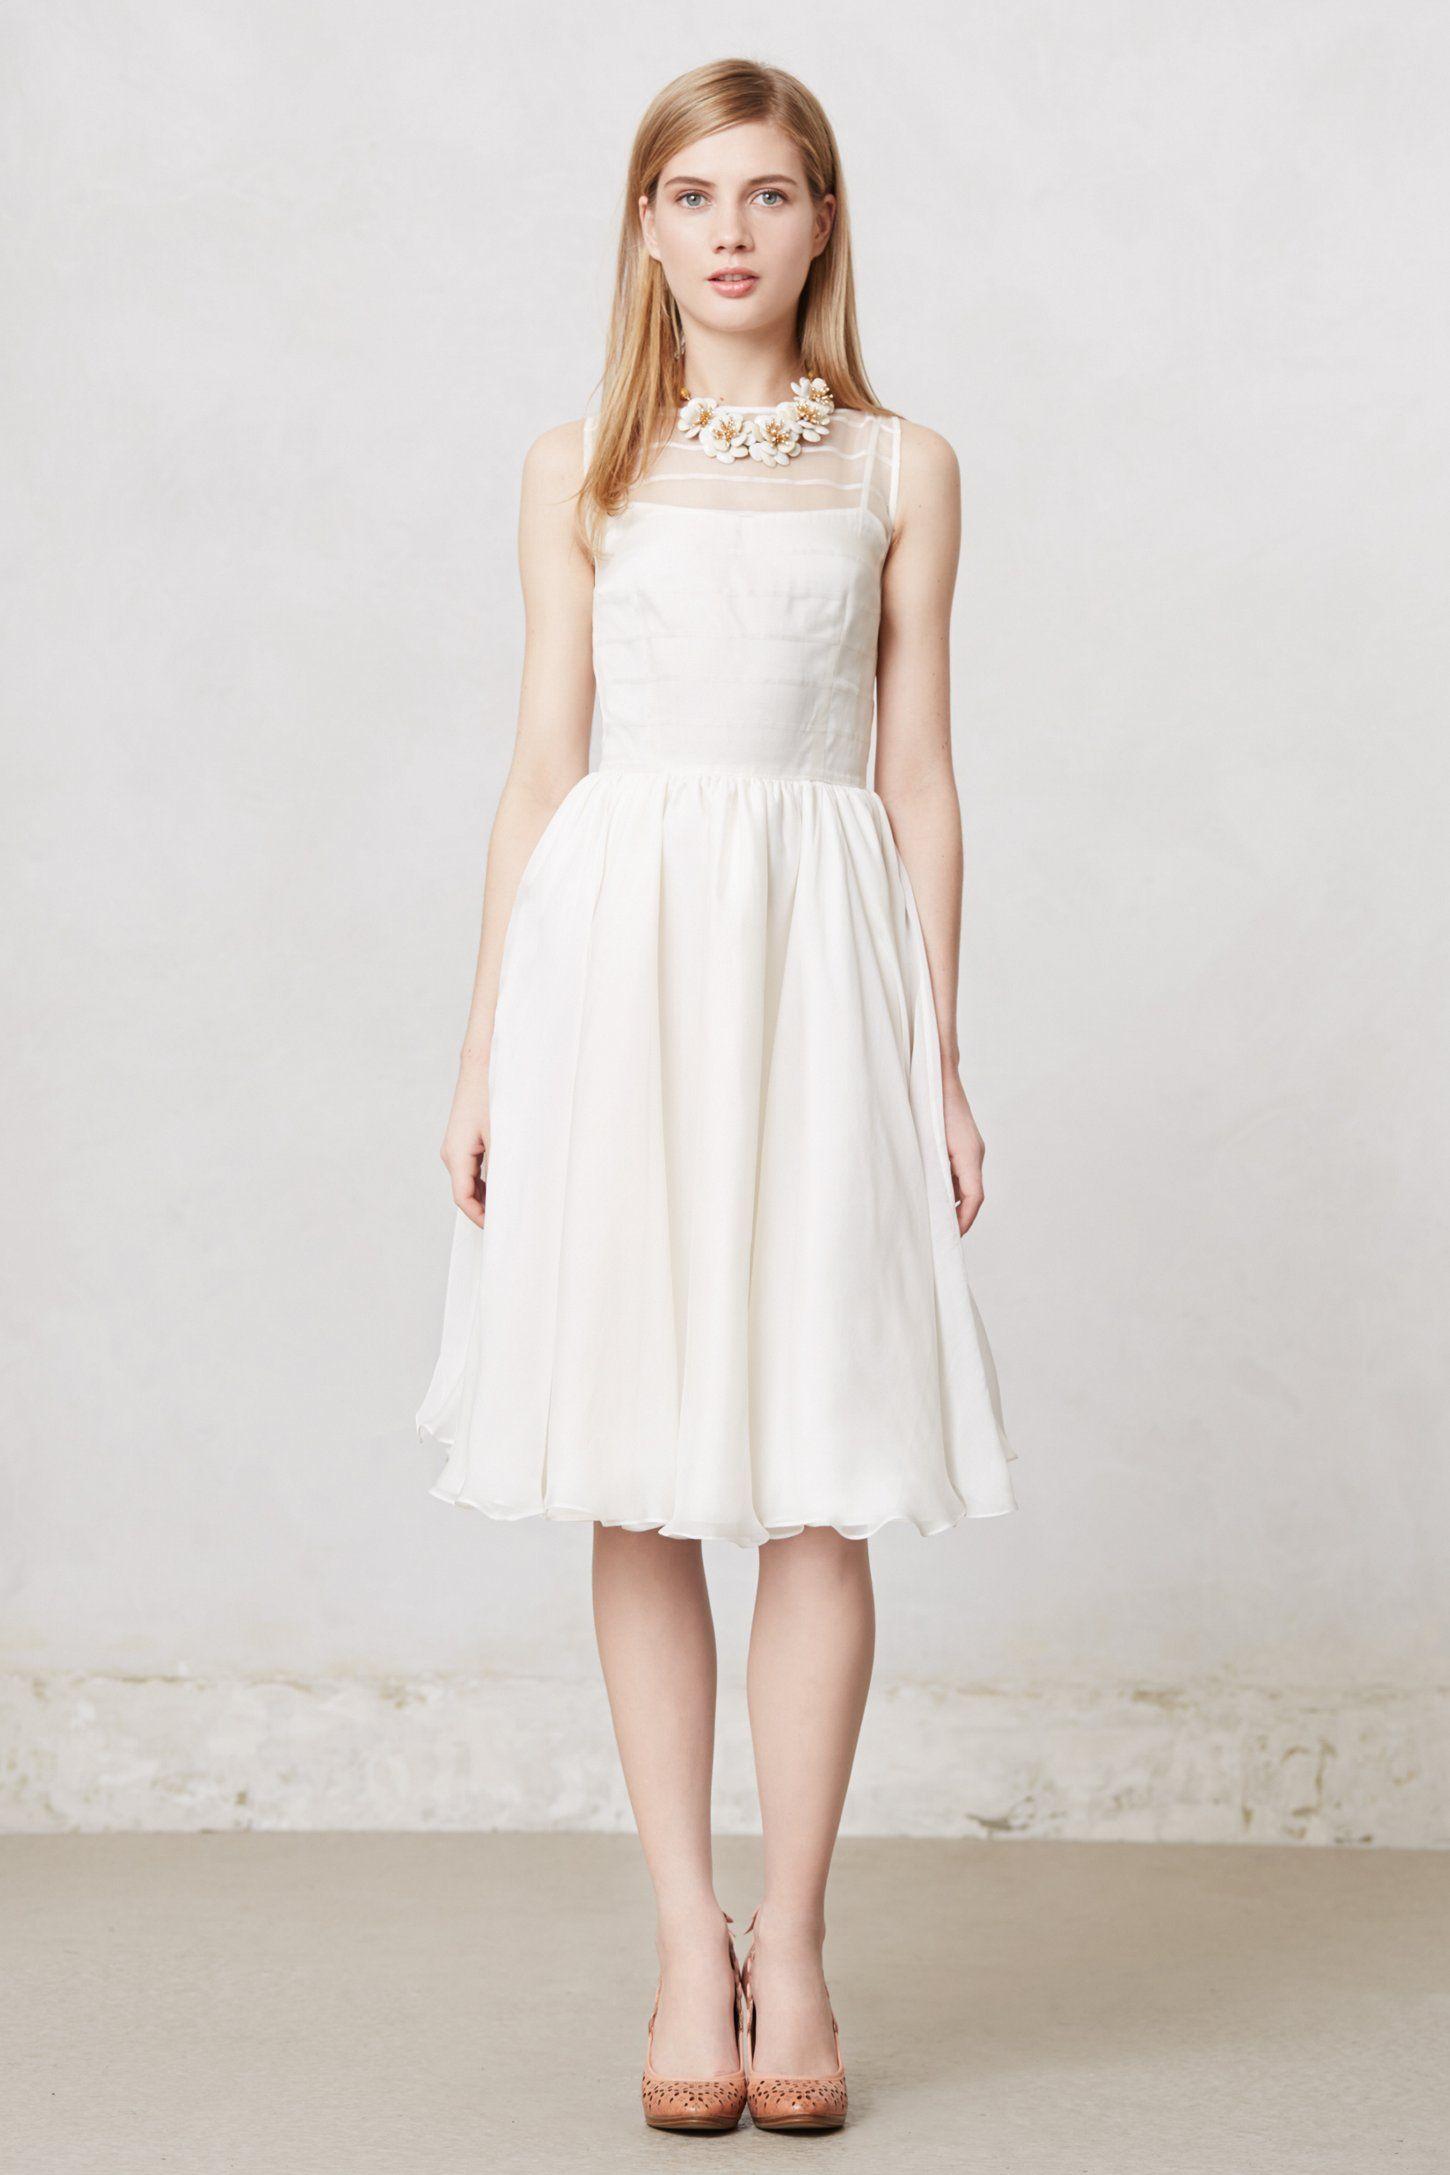 Simple silk wedding dresses  Natalie Dress  Style  Pinterest  Anthropologie Tea length